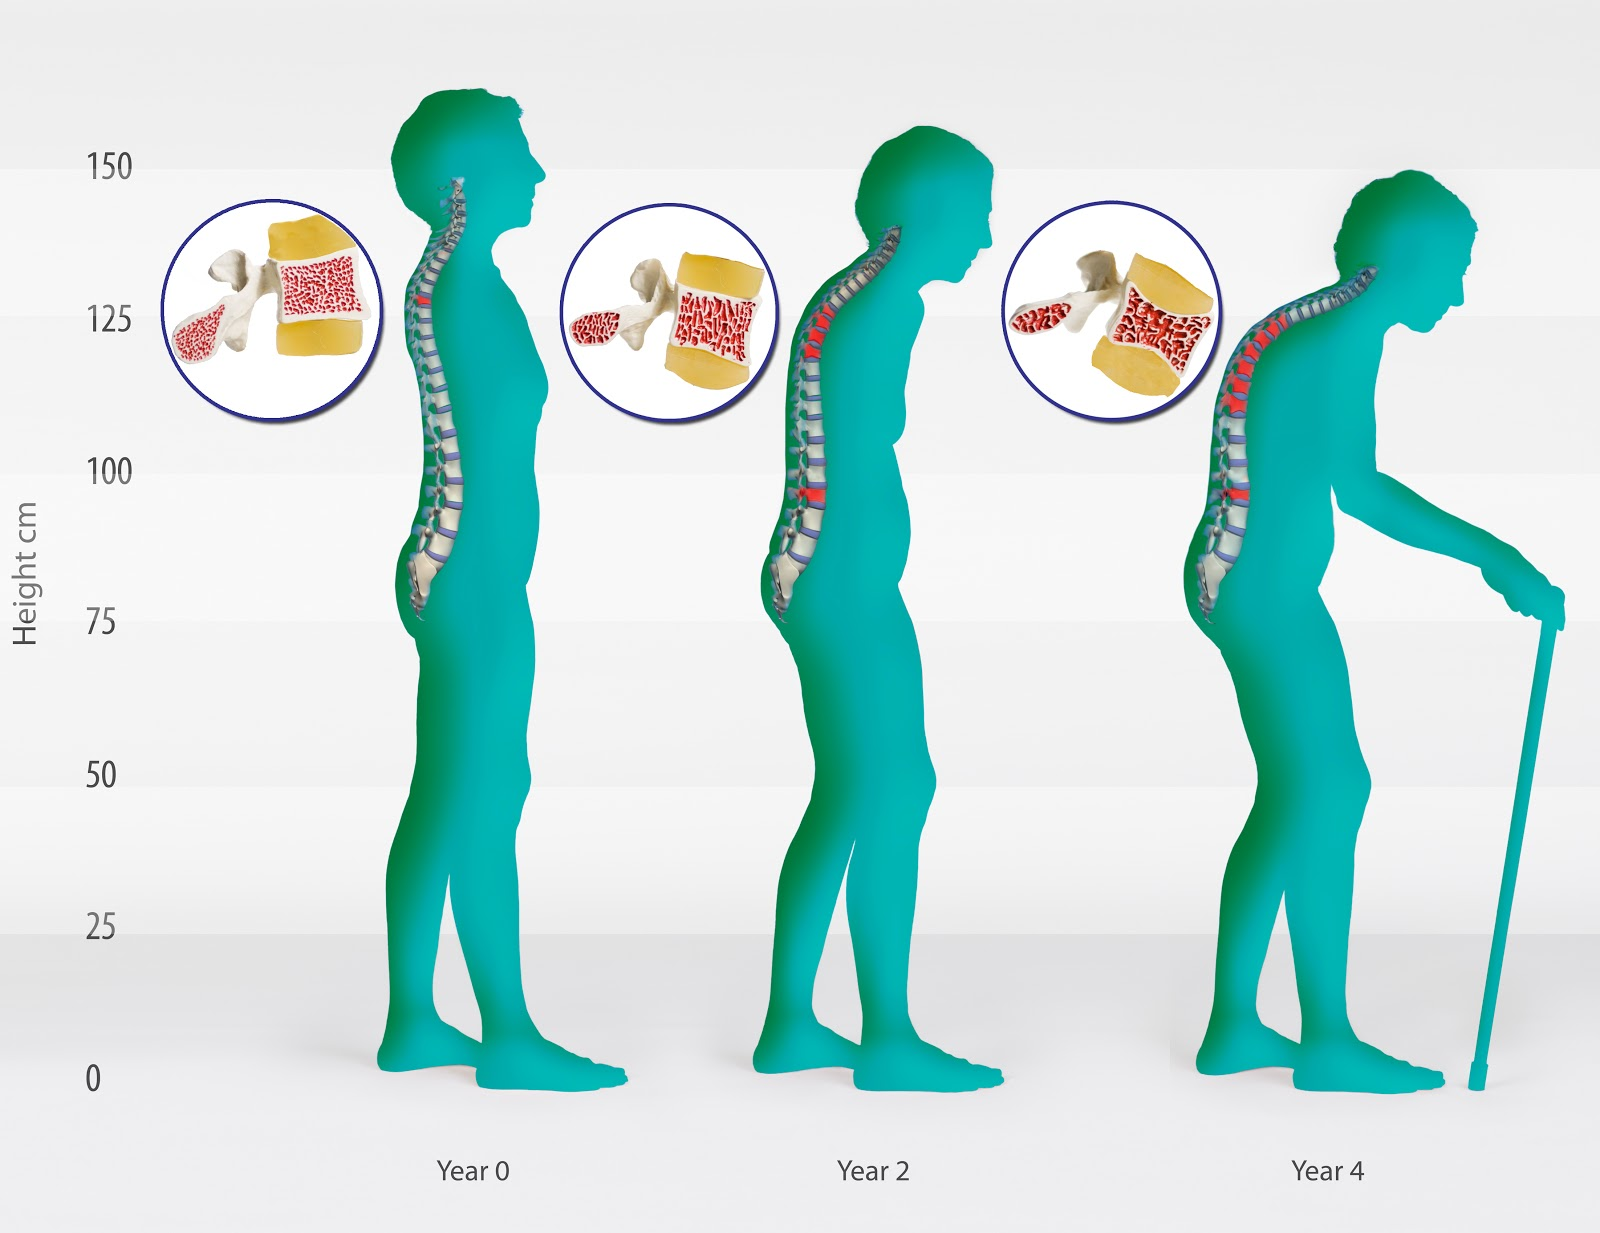 Aurobindo Pharma gets USFDA nod for generic osteoporosis drug